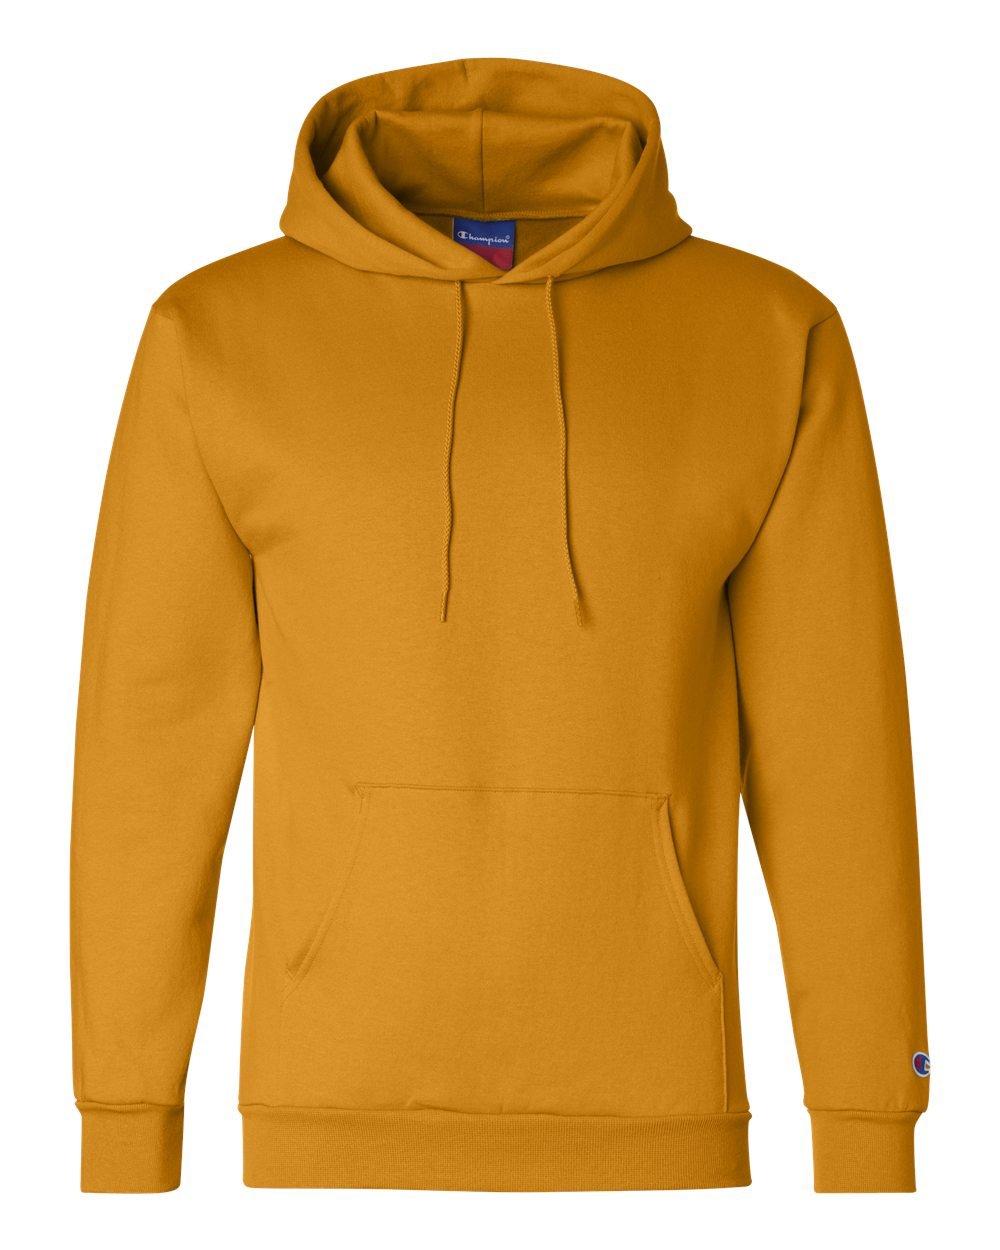 Champion Mens Front Pocket Pullover Hoodie Sweatshirt